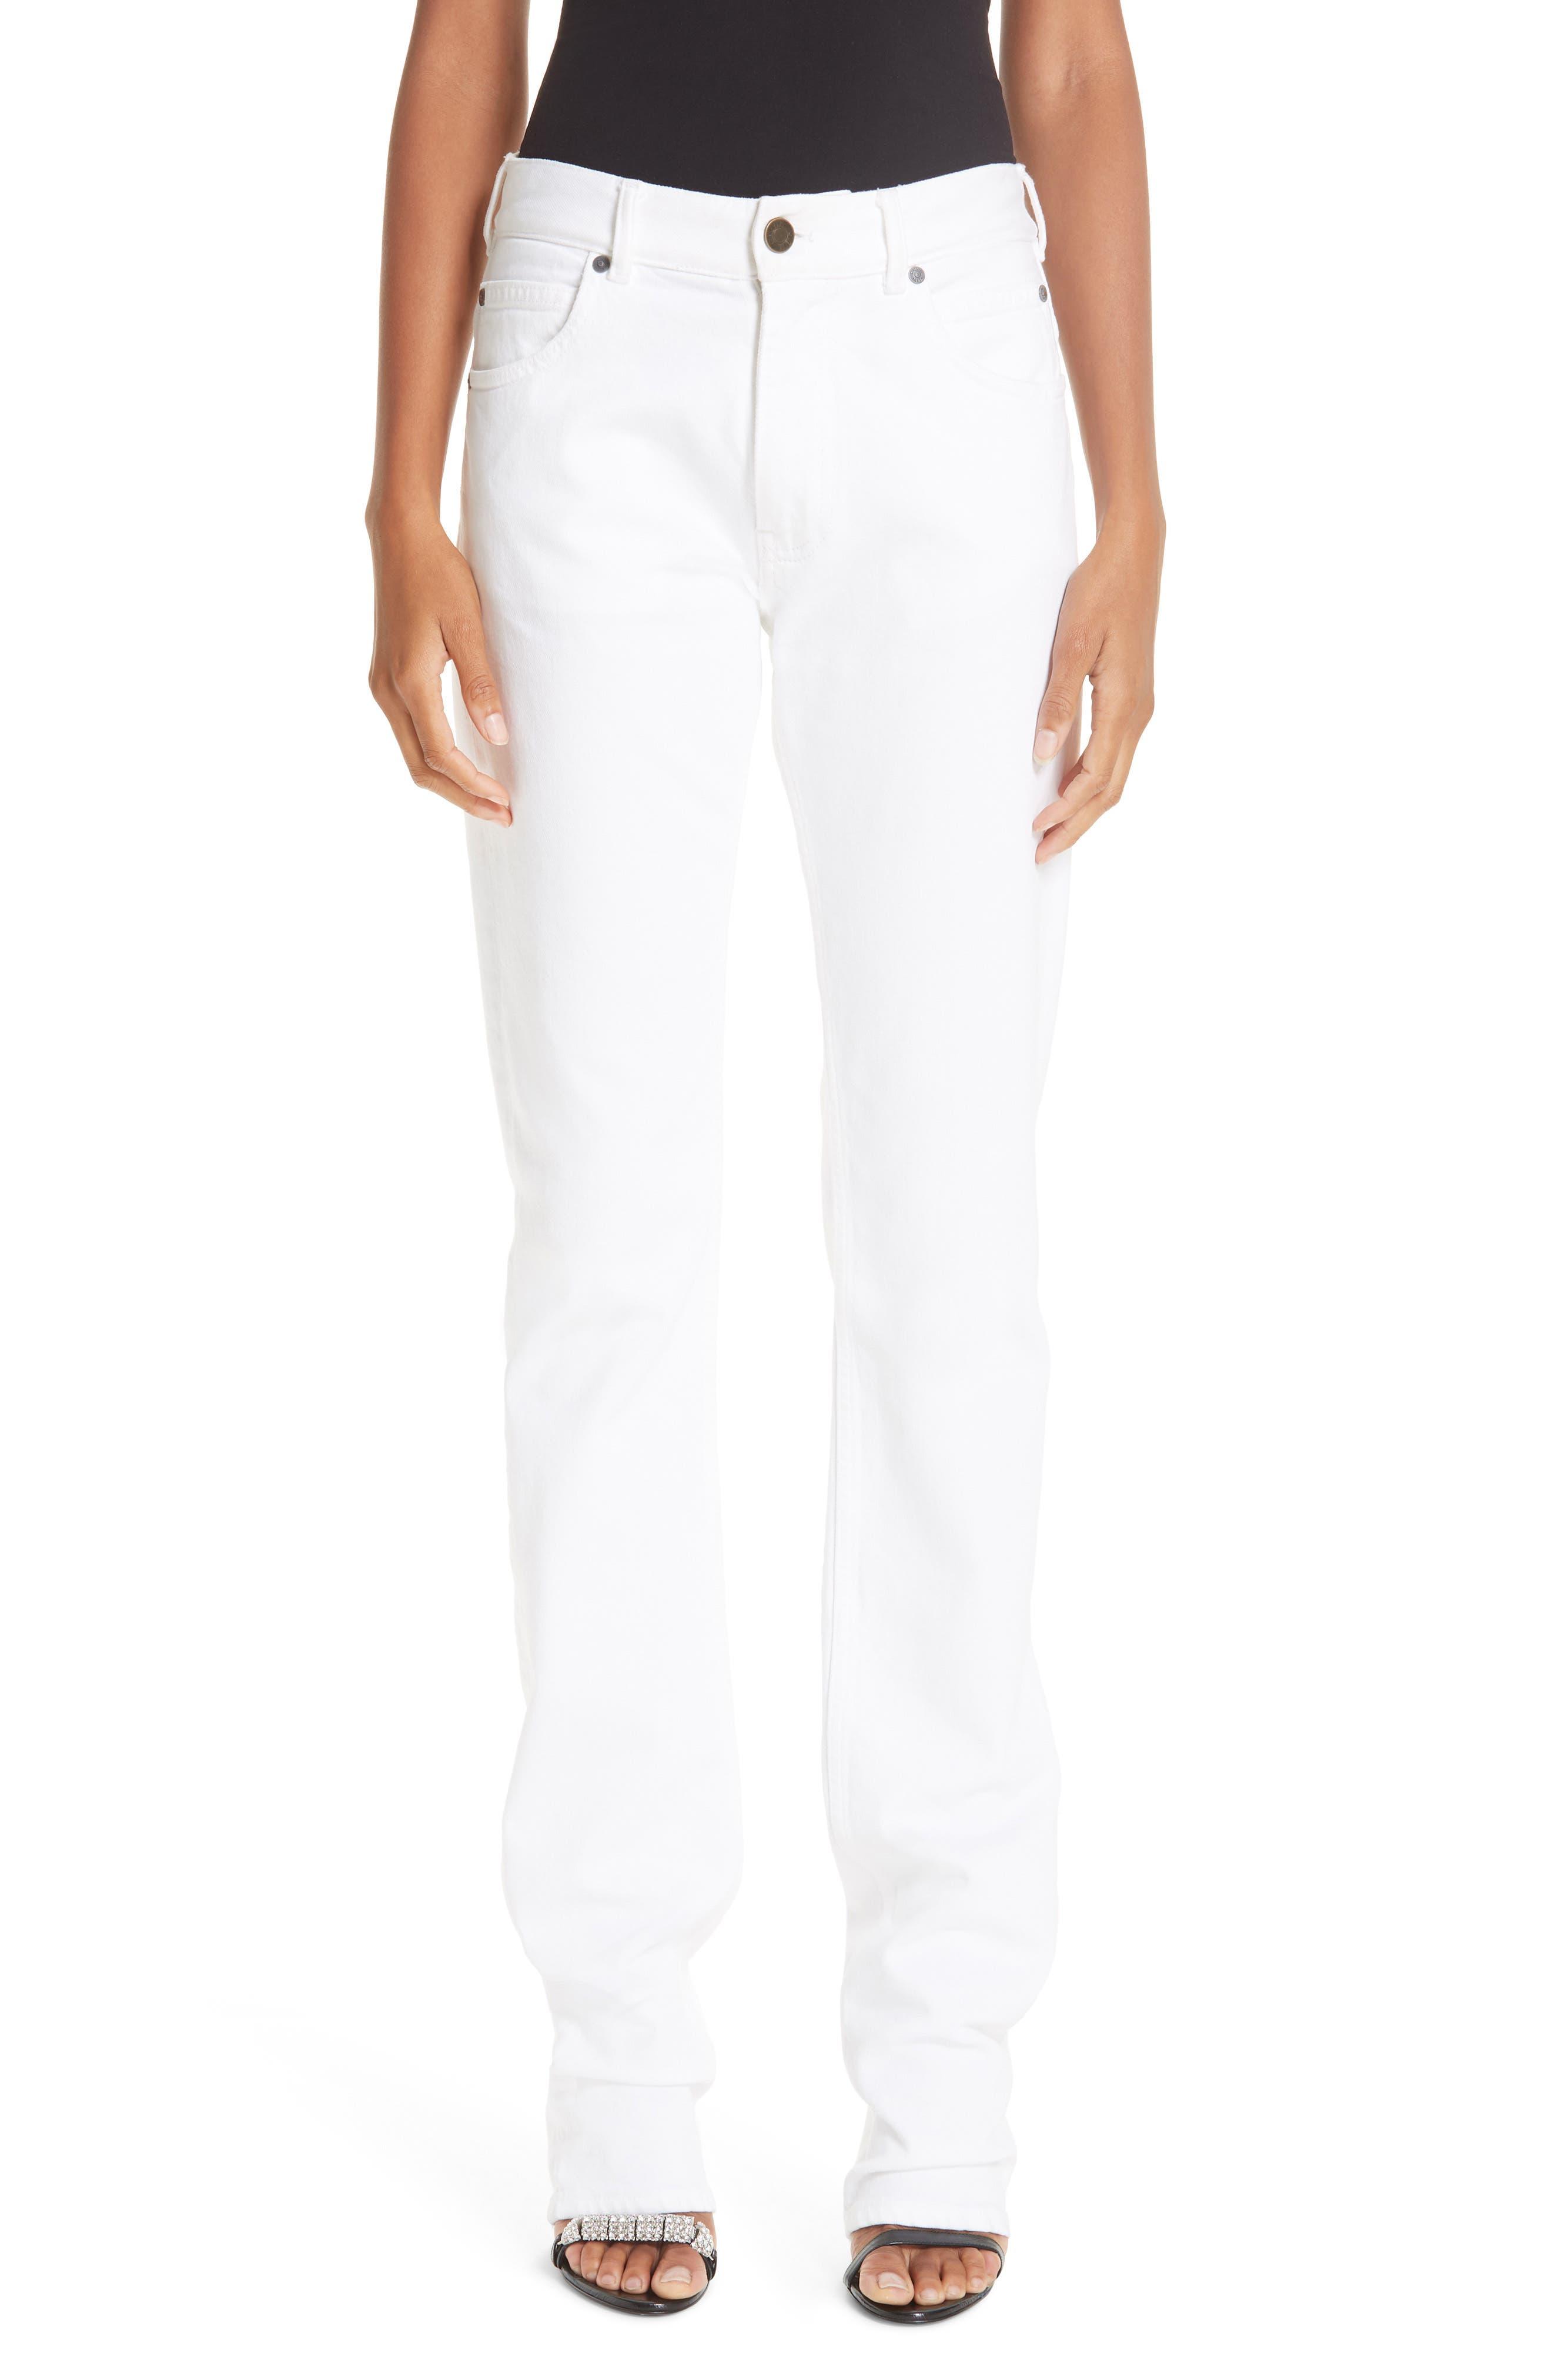 CALVIN KLEIN 205W39NYC Straight Leg Jeans, Main, color, OPTIC WHITE